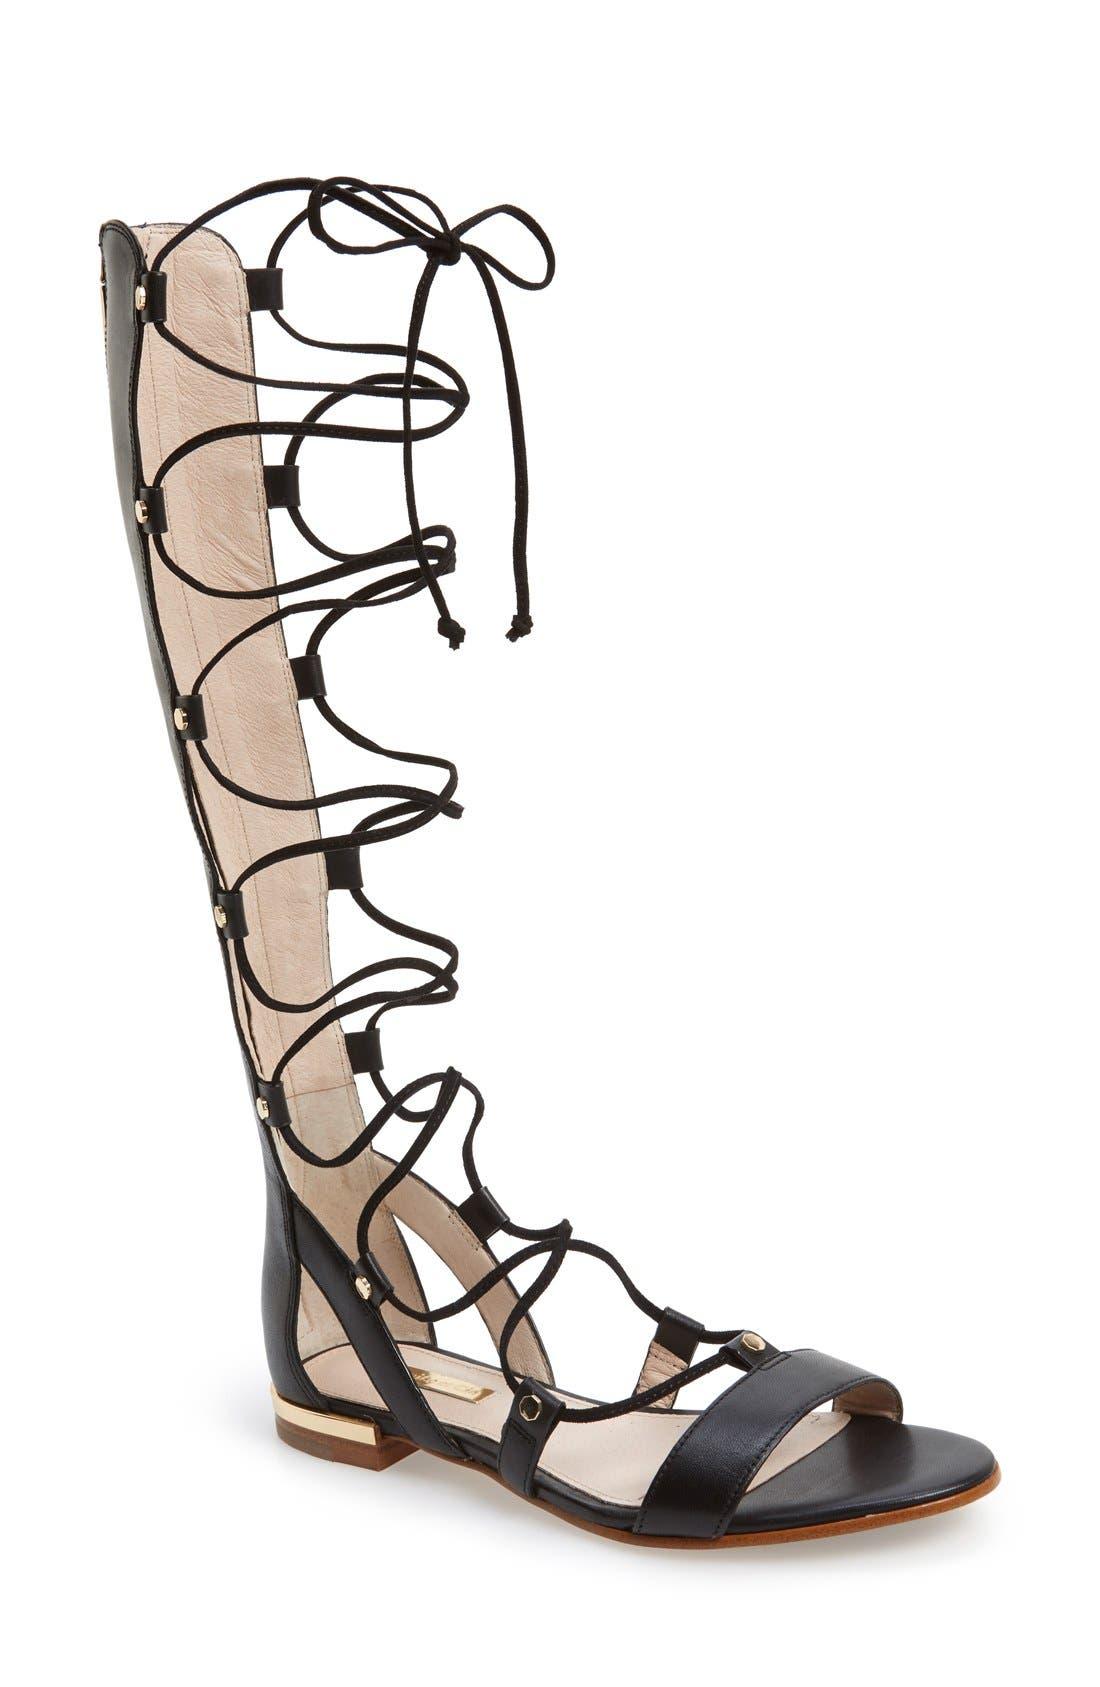 Main Image - Louise et Cie 'Kaelyn' Tall Gladiator Sandal (Women)